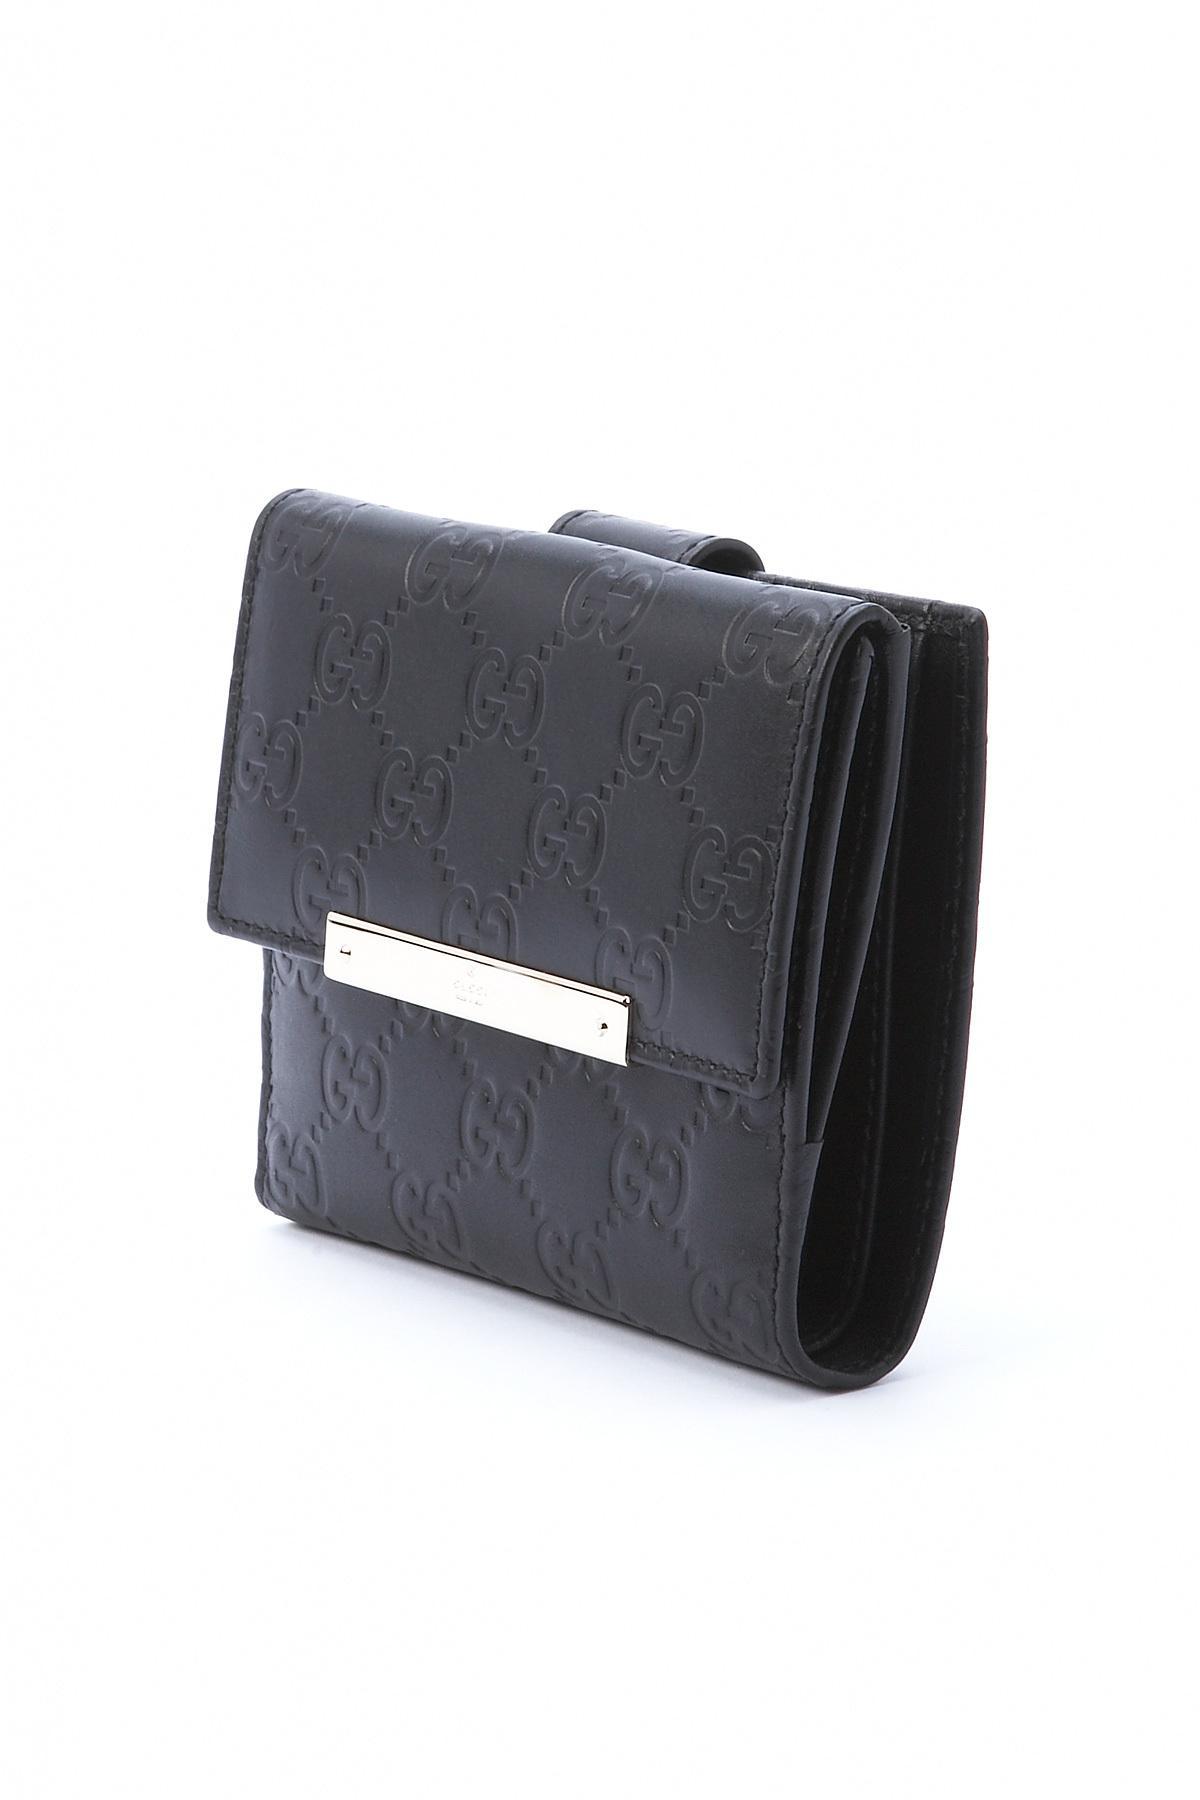 f6b3f2ccd838 Lyst - Gucci Medium French Purse Wallet in Black for Men